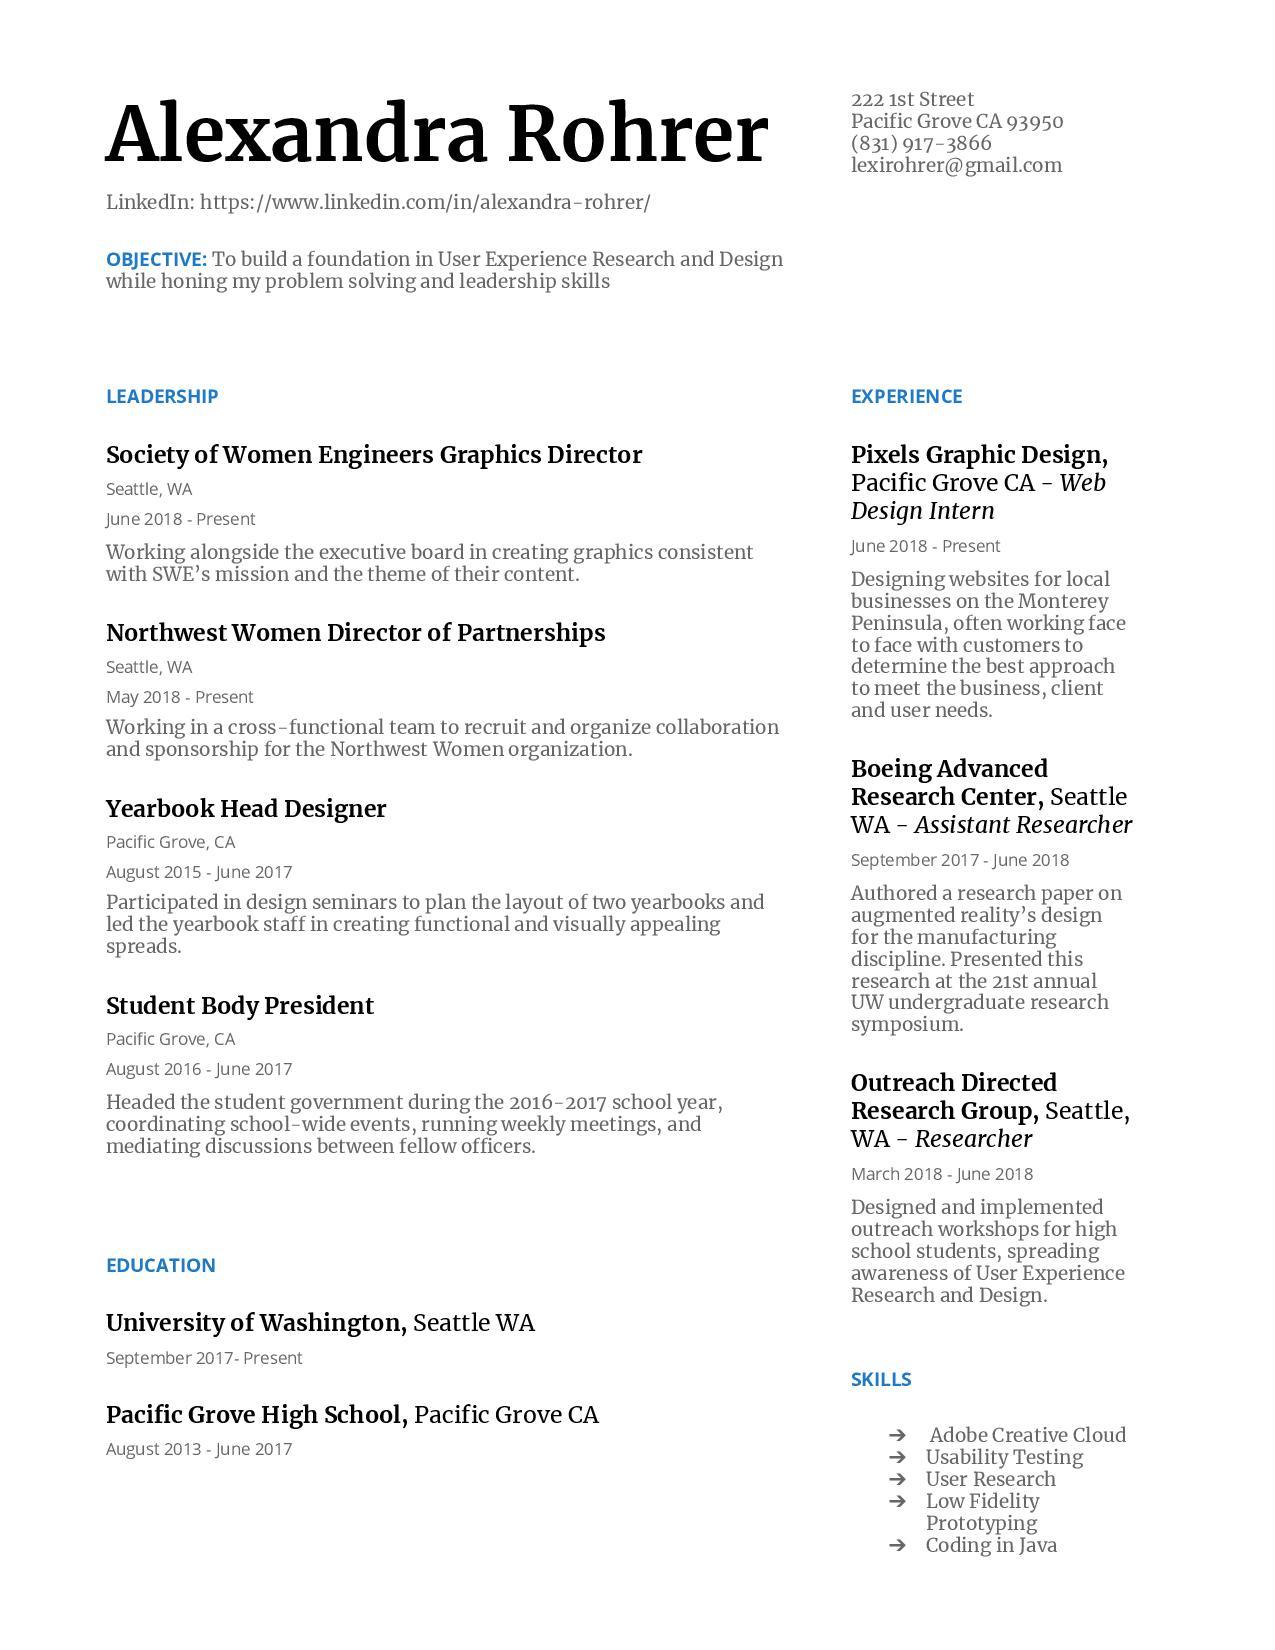 (Most Recent) Resume Freshman Year-page-001.jpg